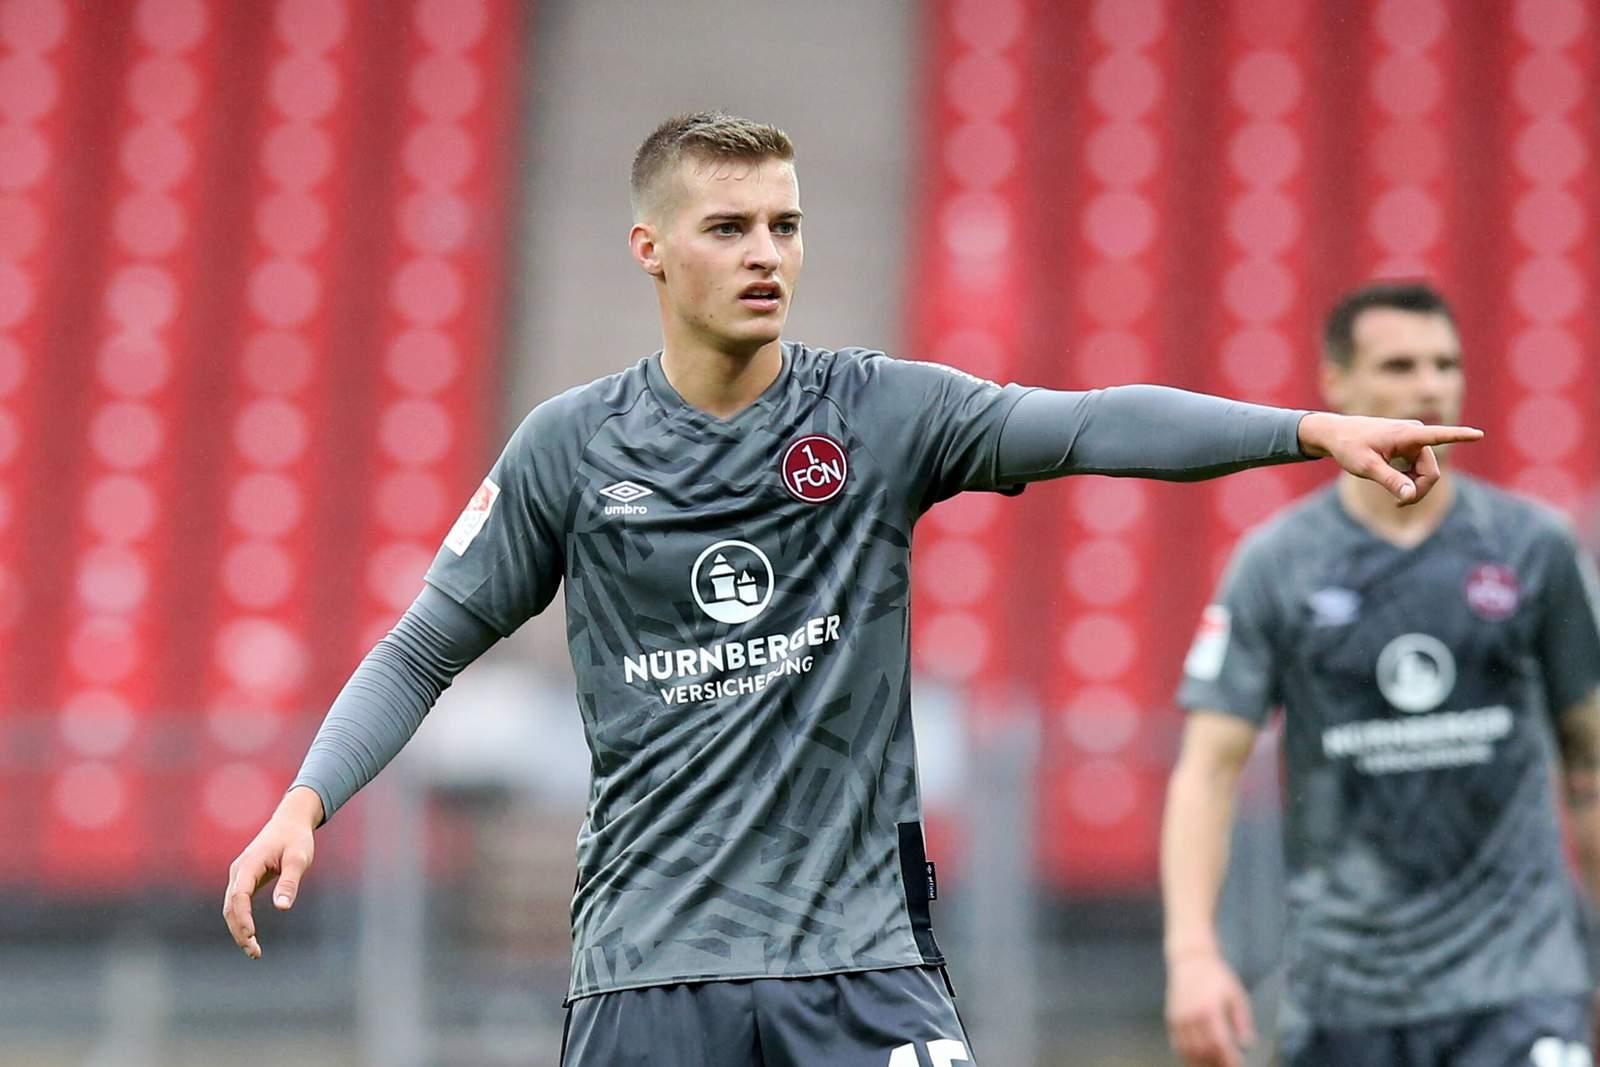 Fabian Nürnberger vom 1. FC Nürnberg